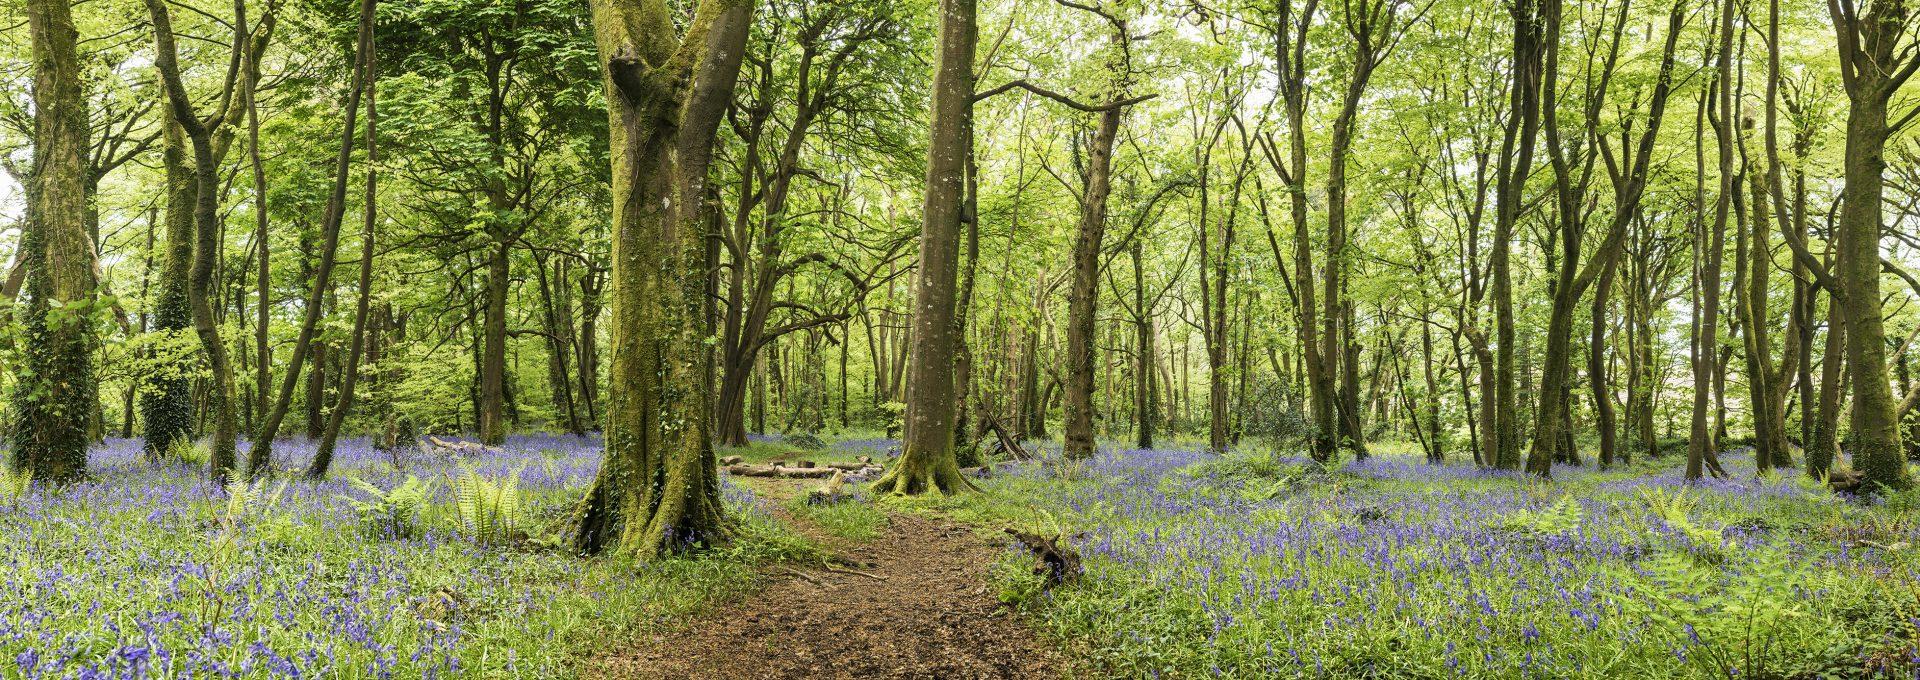 Pendarves Woods